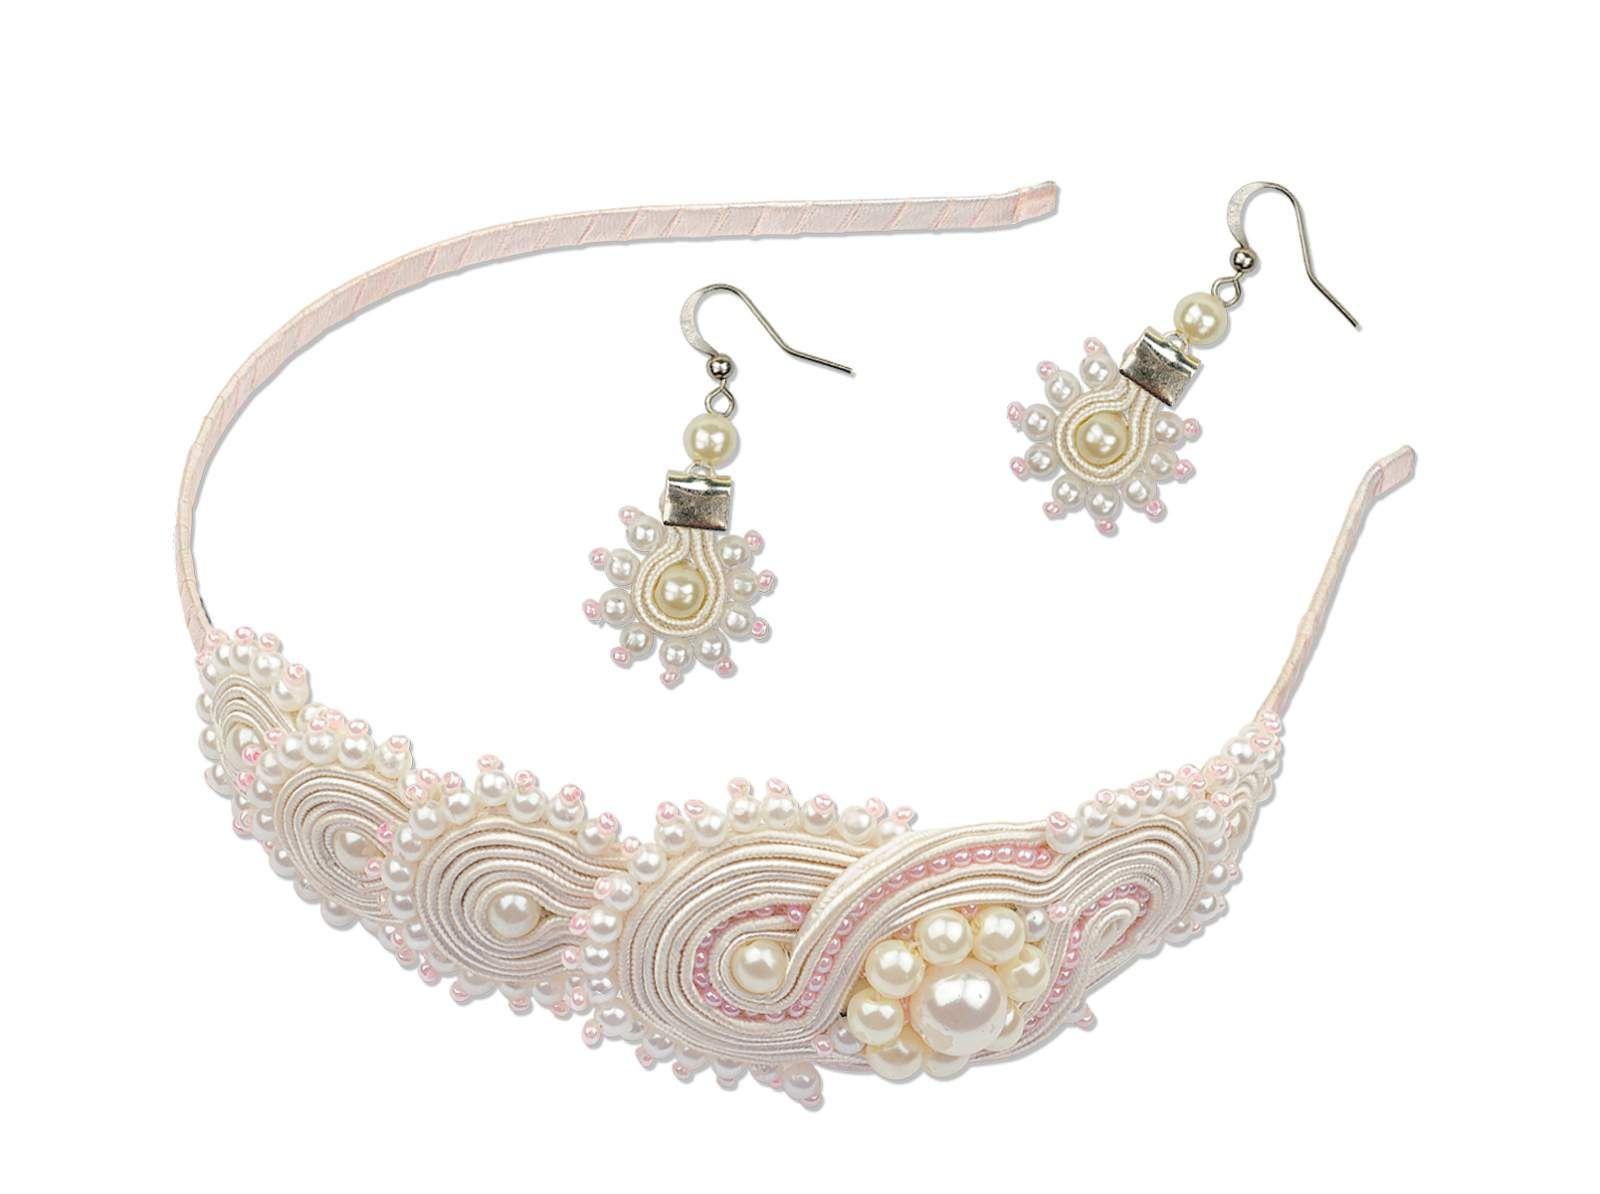 1445АС Soutache headband and earrings Sunrise of Pearls - Product description